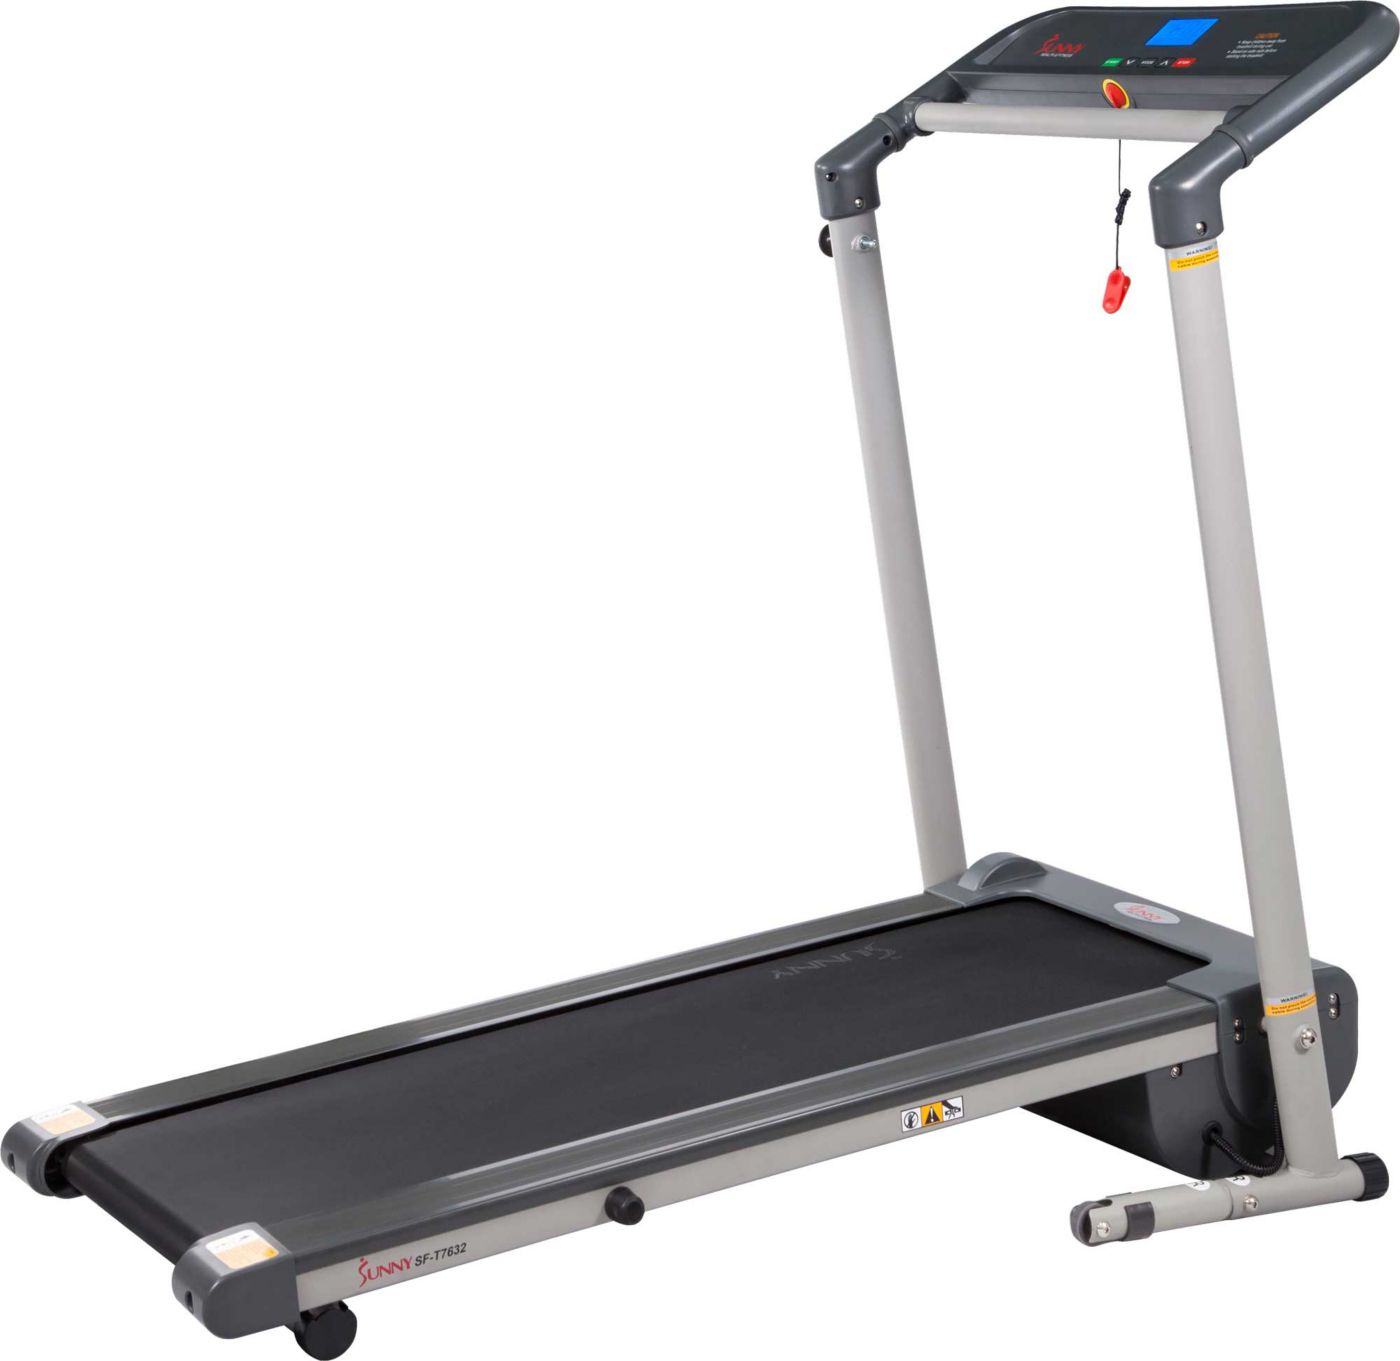 Sunny Health & Fitness SF-T7632 Space Saving Folding Treadmill